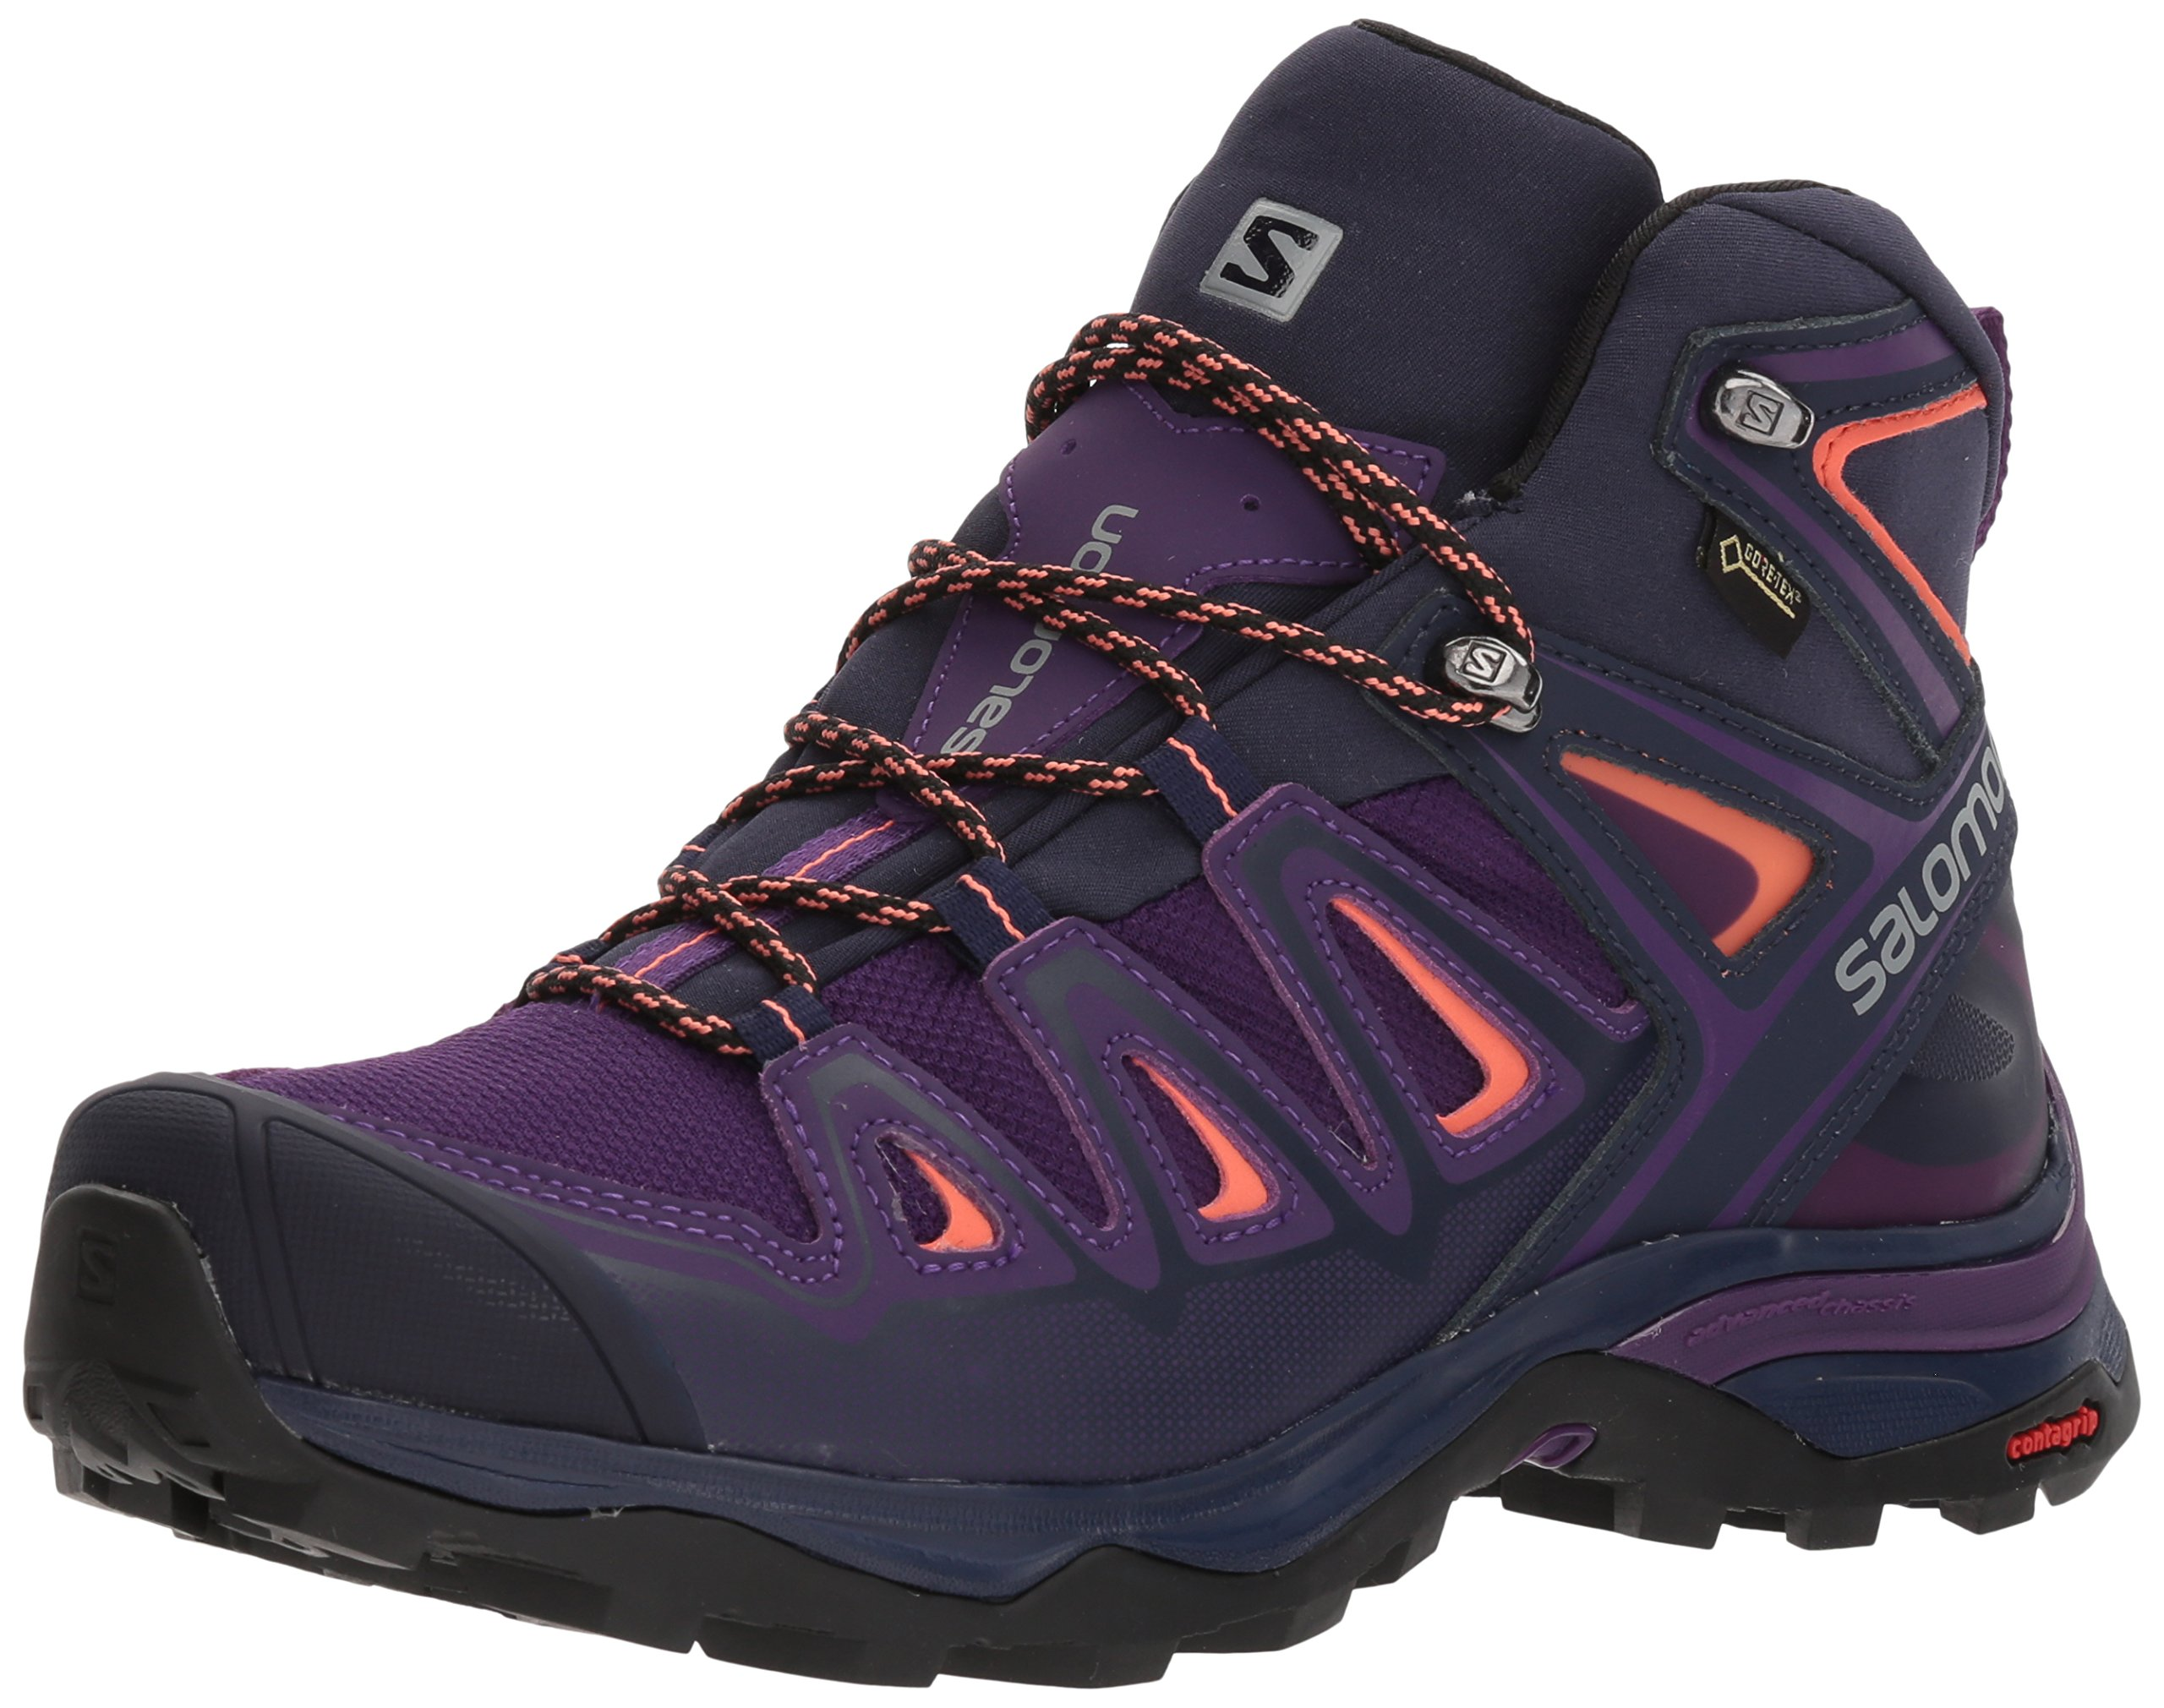 Salomon Women's X Ultra 3 Mid GTX W Hiking Shoe,Acai,9 M US